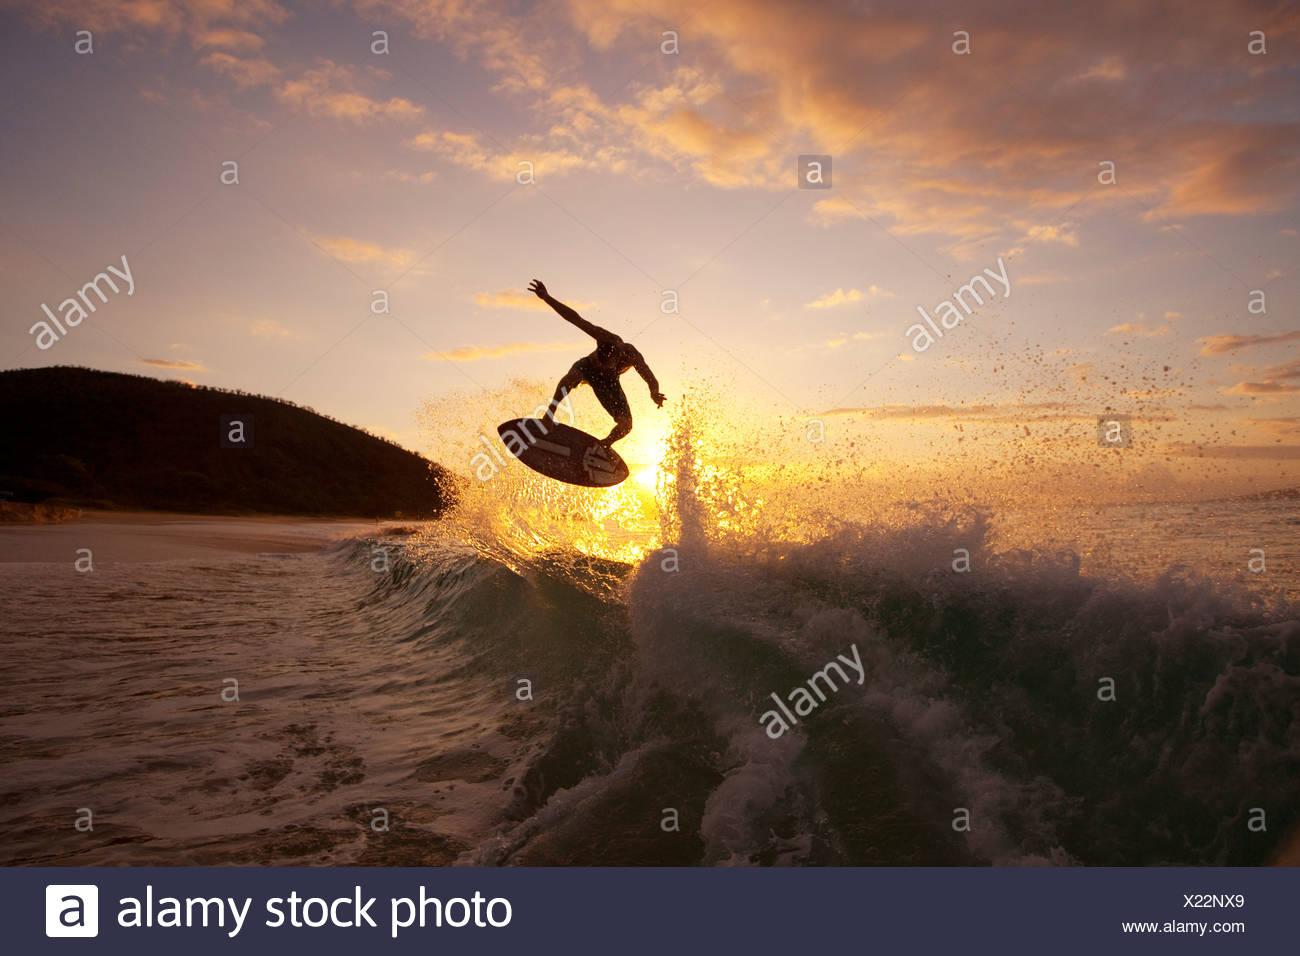 Hawai, Maui, Makena, Skimboarder obtiene Big Air una ola al atardecer Imagen De Stock